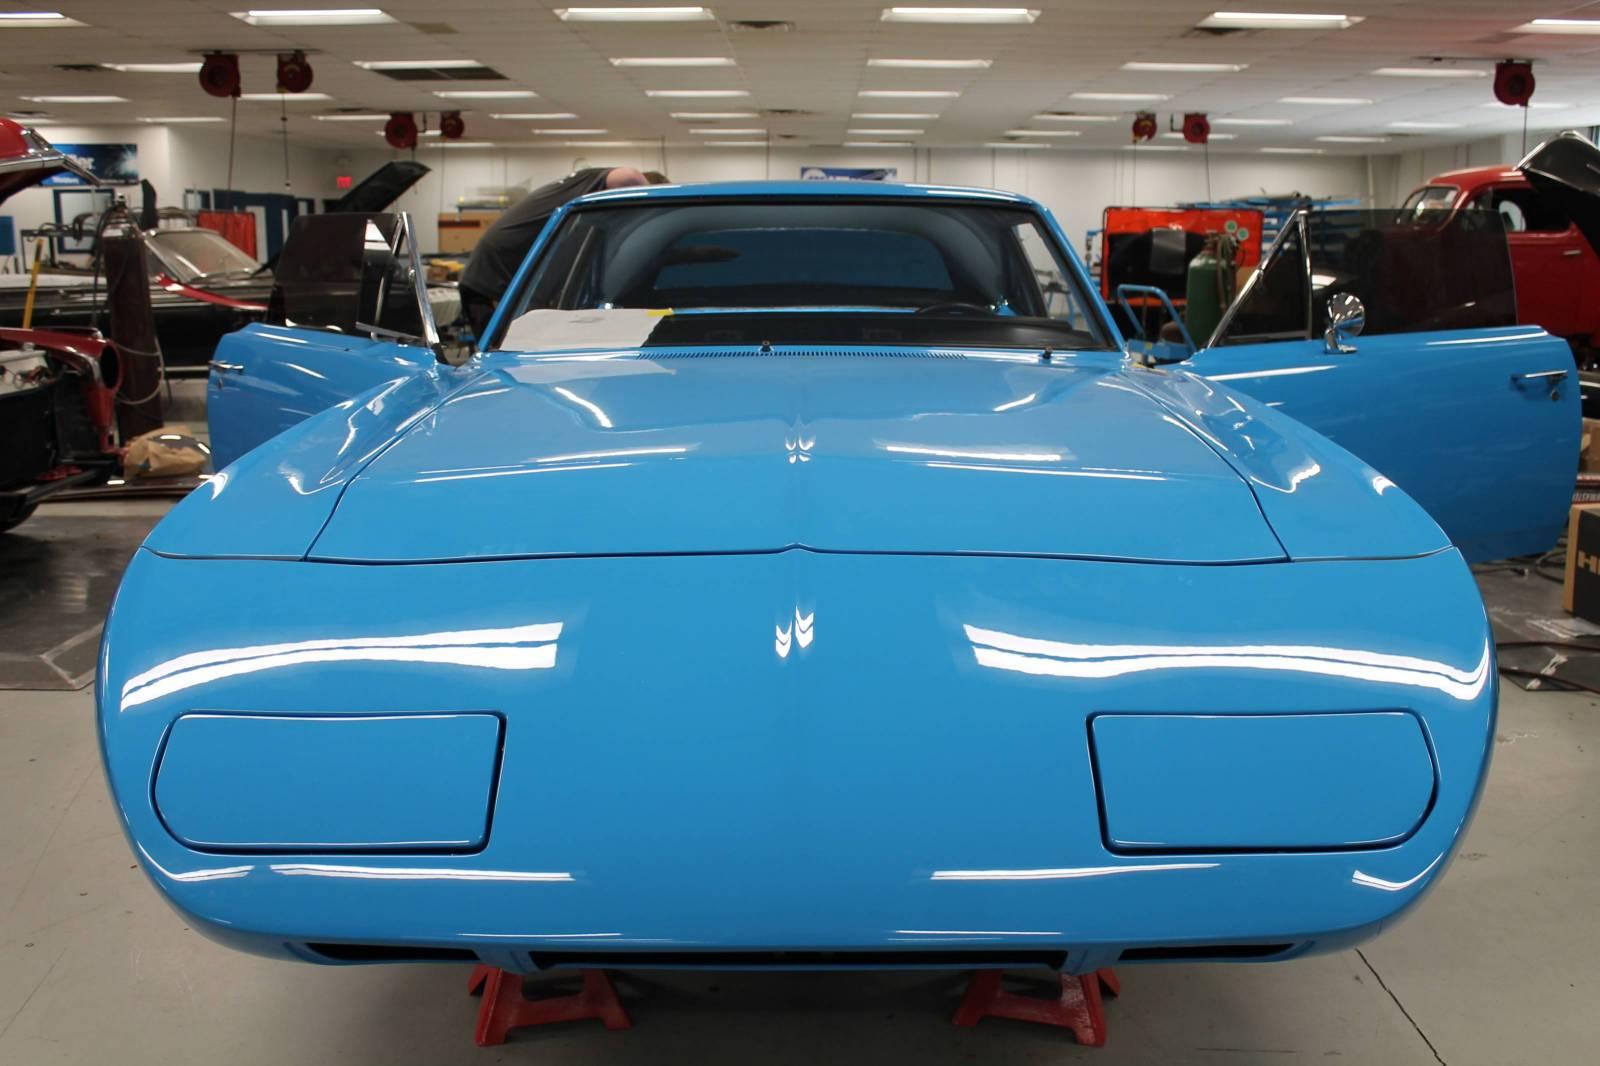 1970 Superbird Wiring Harness Diagram Schematics Dodge Hemi Engine Swap Plymouth Clone With A 392 Ci V8 Depot 426